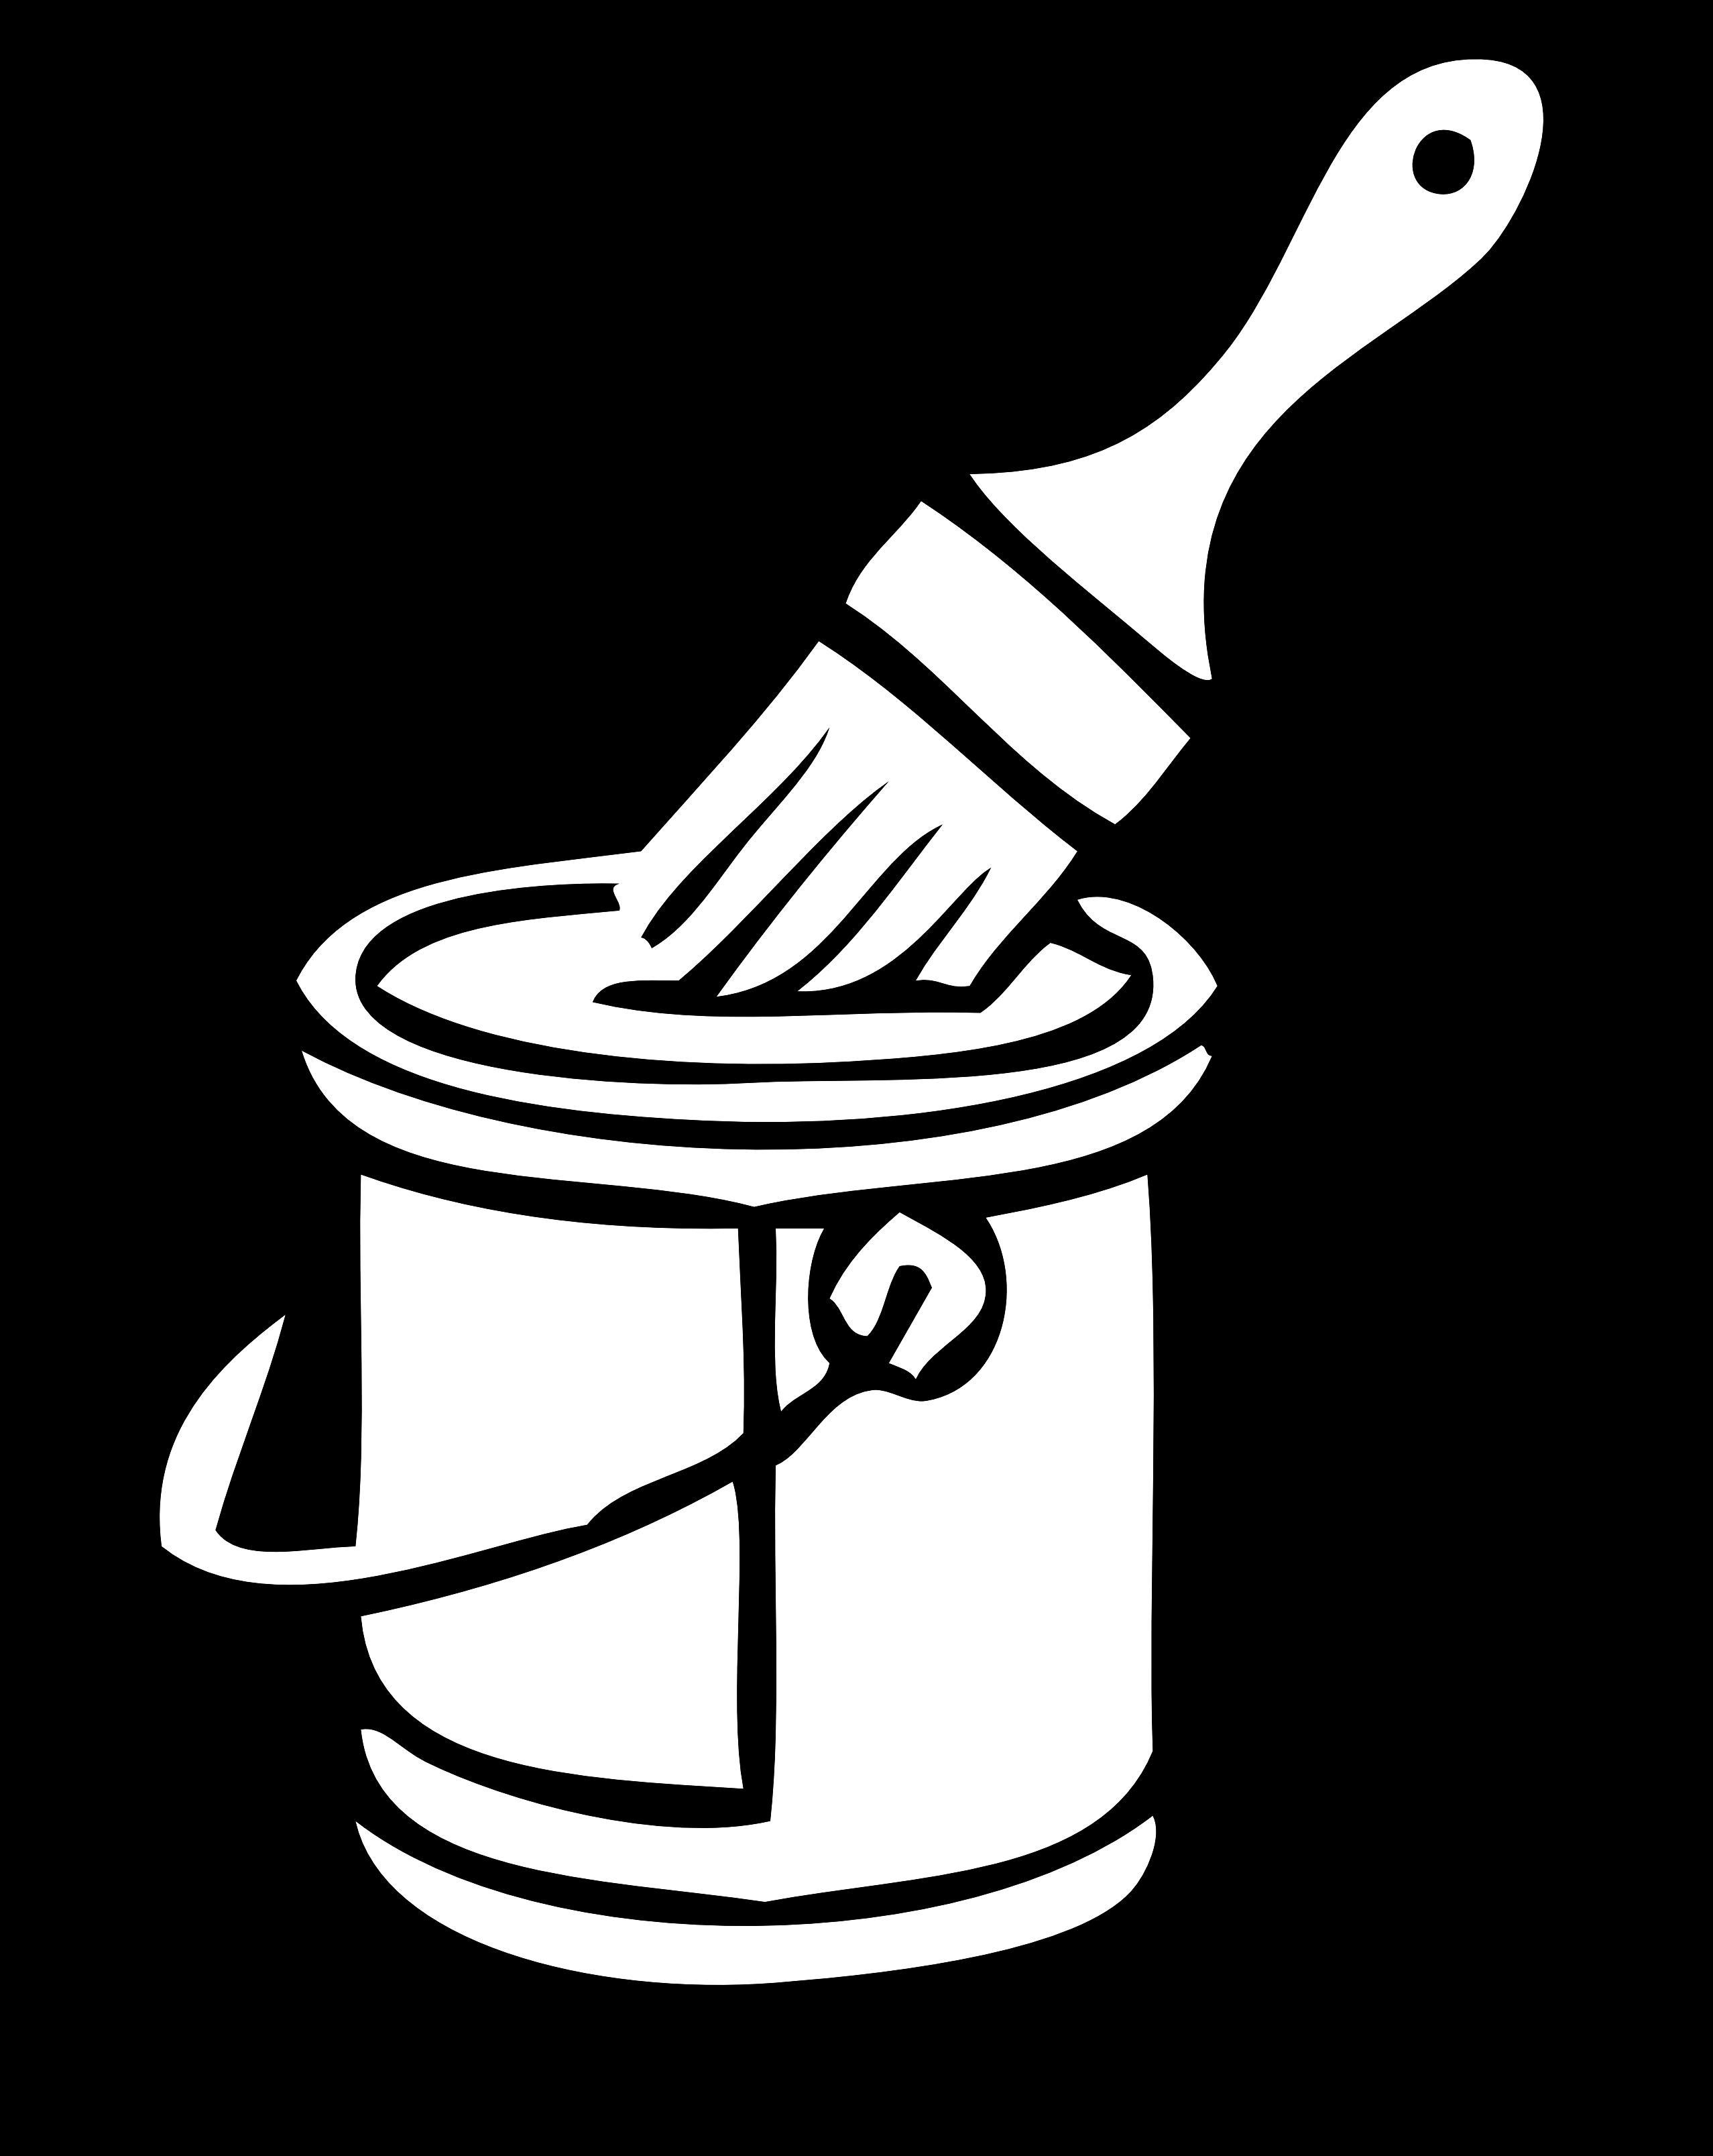 Paintbrush clipart cartoon. Outline clip art library